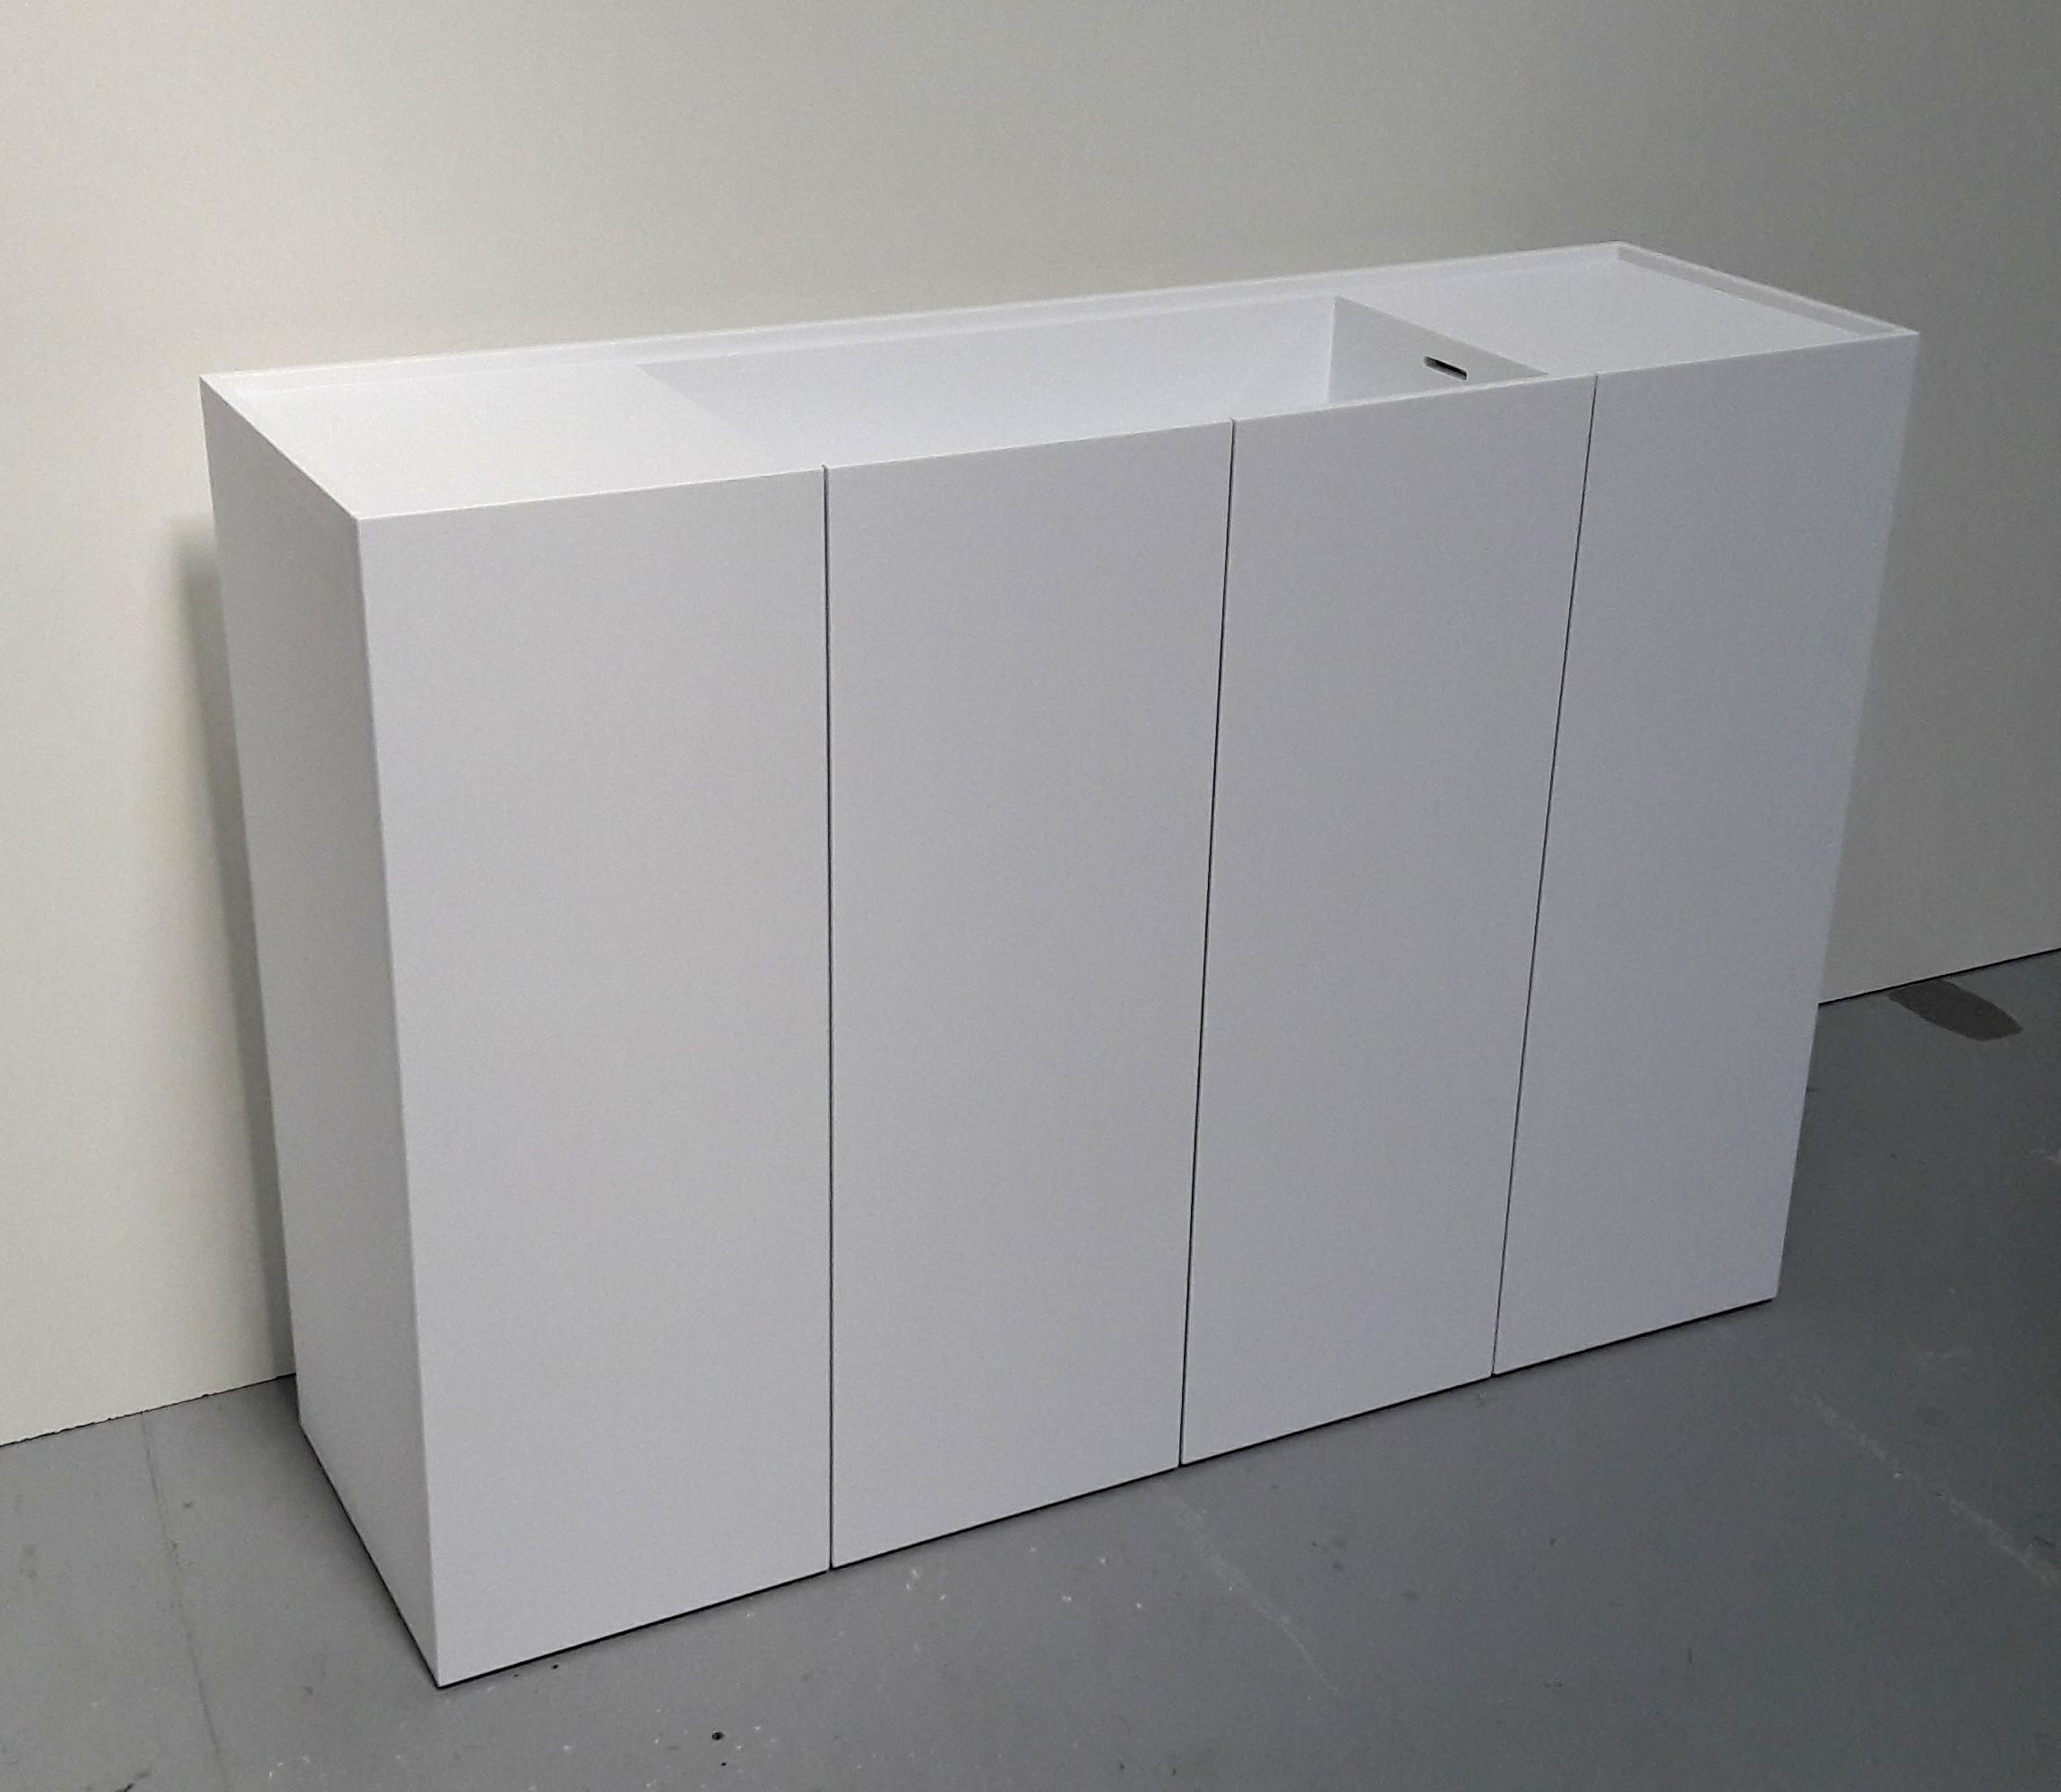 Corian badeværelsesmøbel med integreret vask i farven Designer White